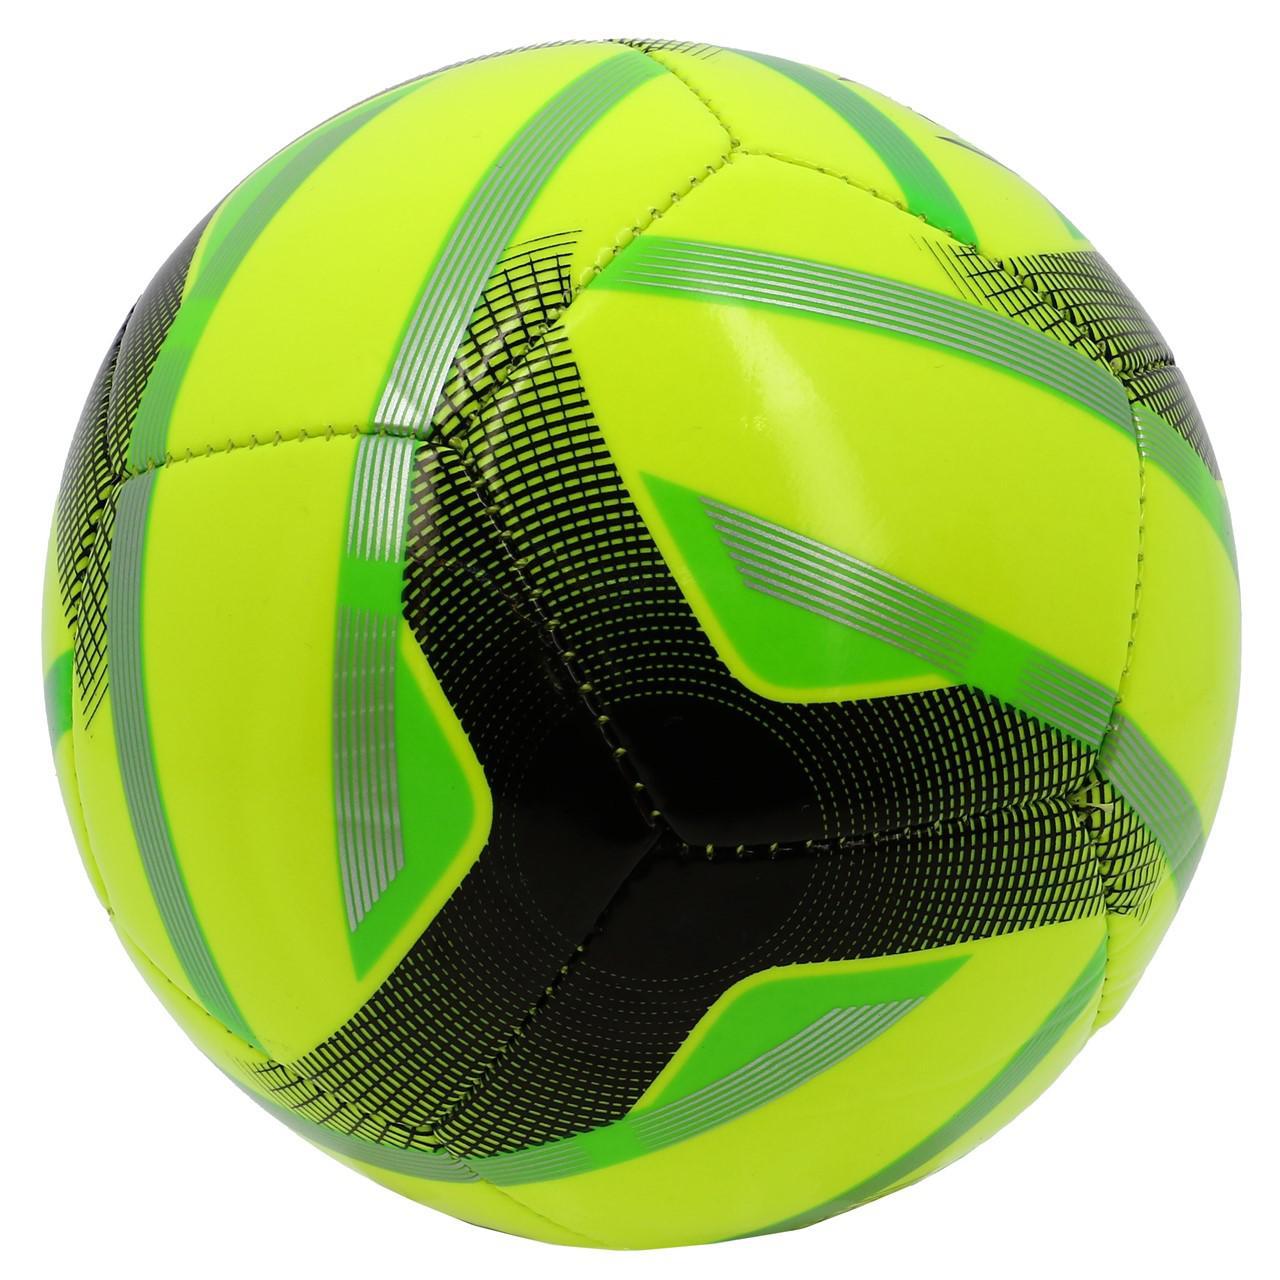 Mini-Ball-Uhlsport-Team-Mini-taille1-Yellow-50001-New thumbnail 3